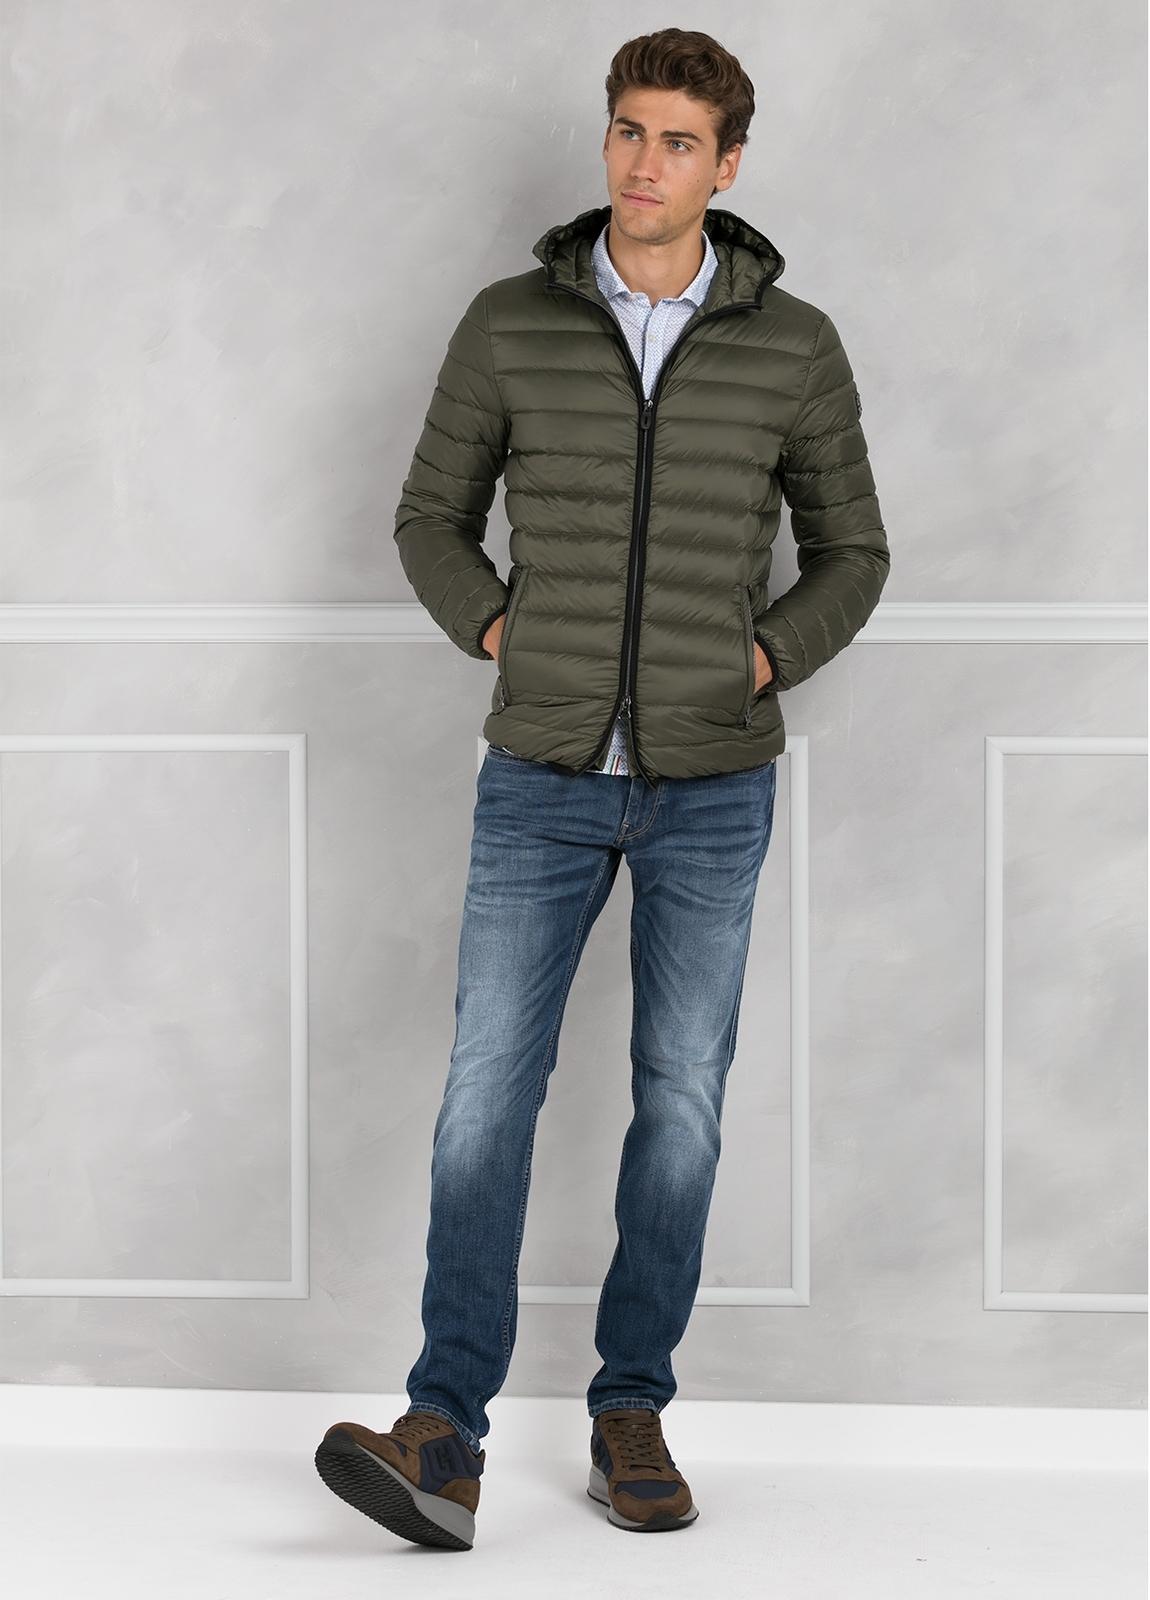 Chaqueta con capucha modelo ZEFIRO color kaki, tejido técnico. - Ítem3